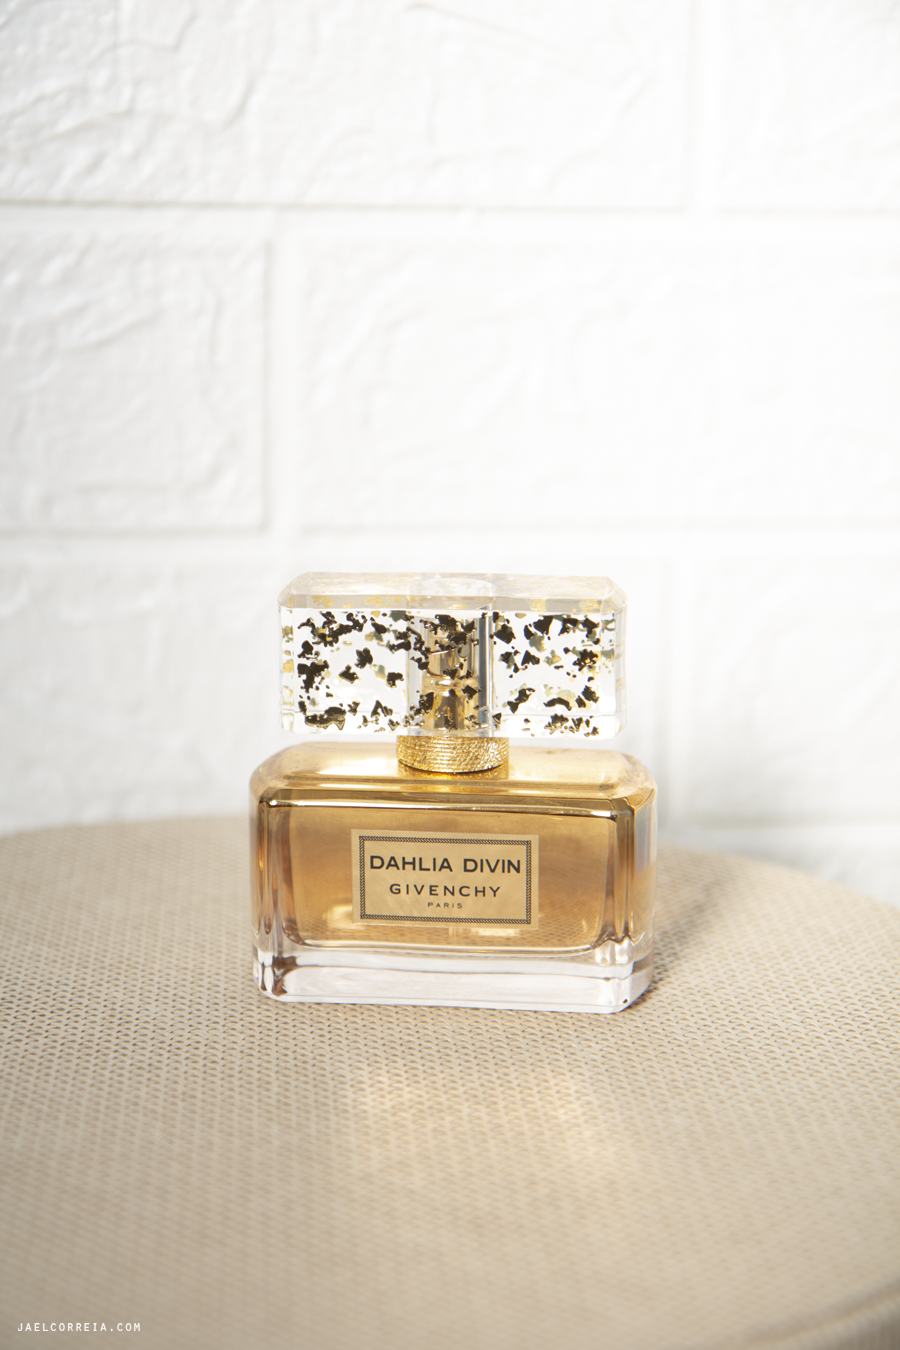 givenchy dahlia divin eau de parfum intense le nectar de parfum notino loja online cosmetica perfumaria portugal barata acessivel jael correia notas perfumes beleza 3